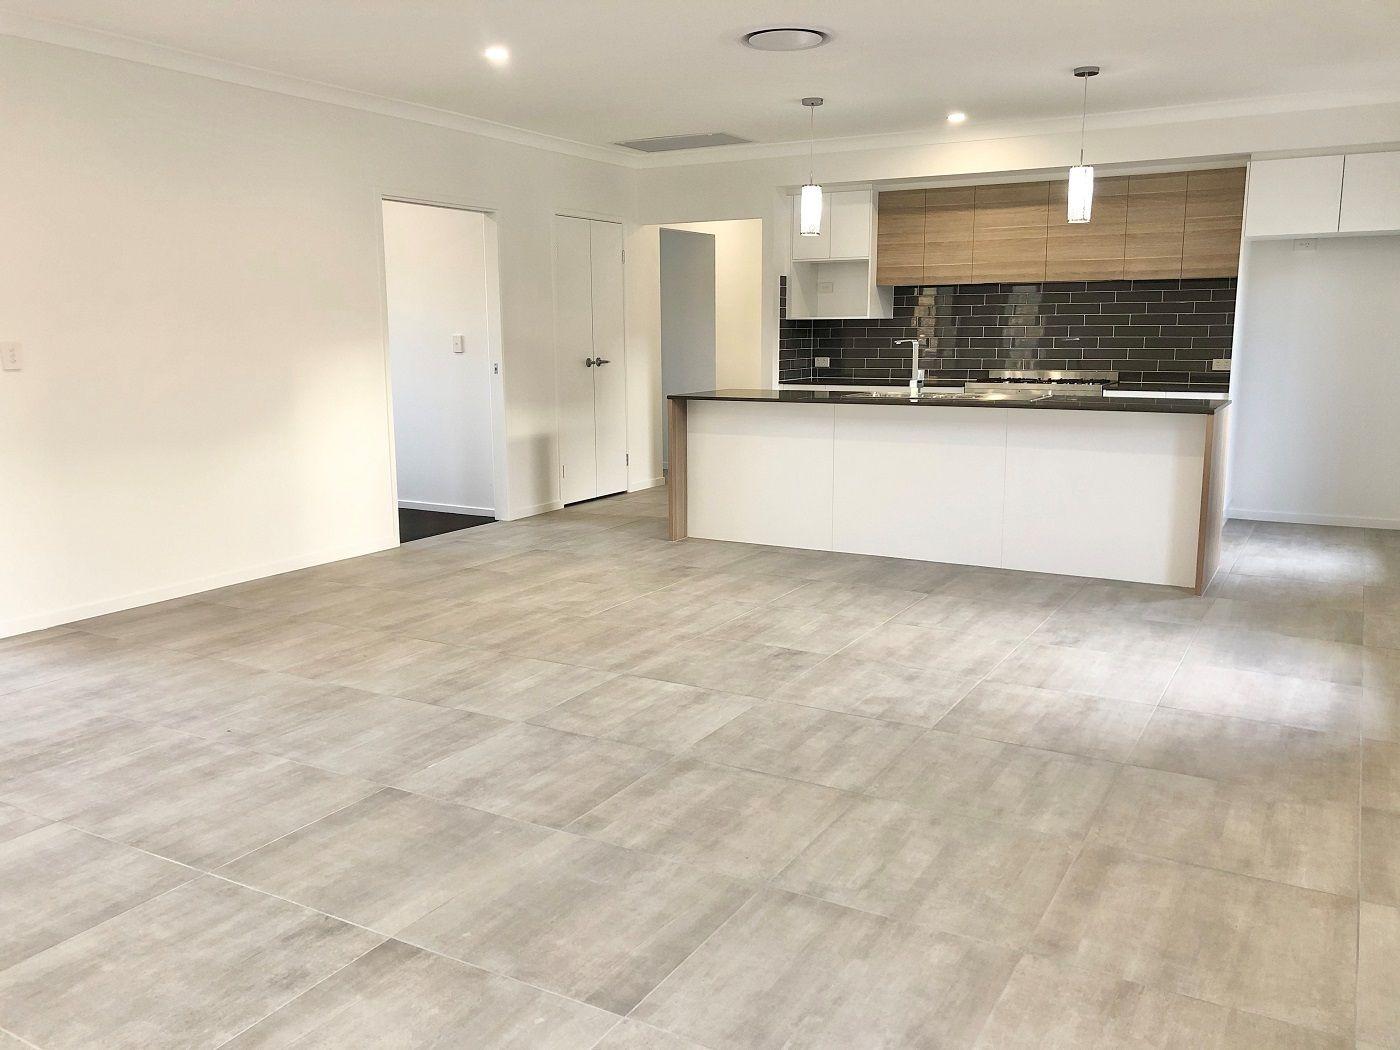 Lot 320 Chestnut Street, Bahrs Scrub QLD 4207, Image 2